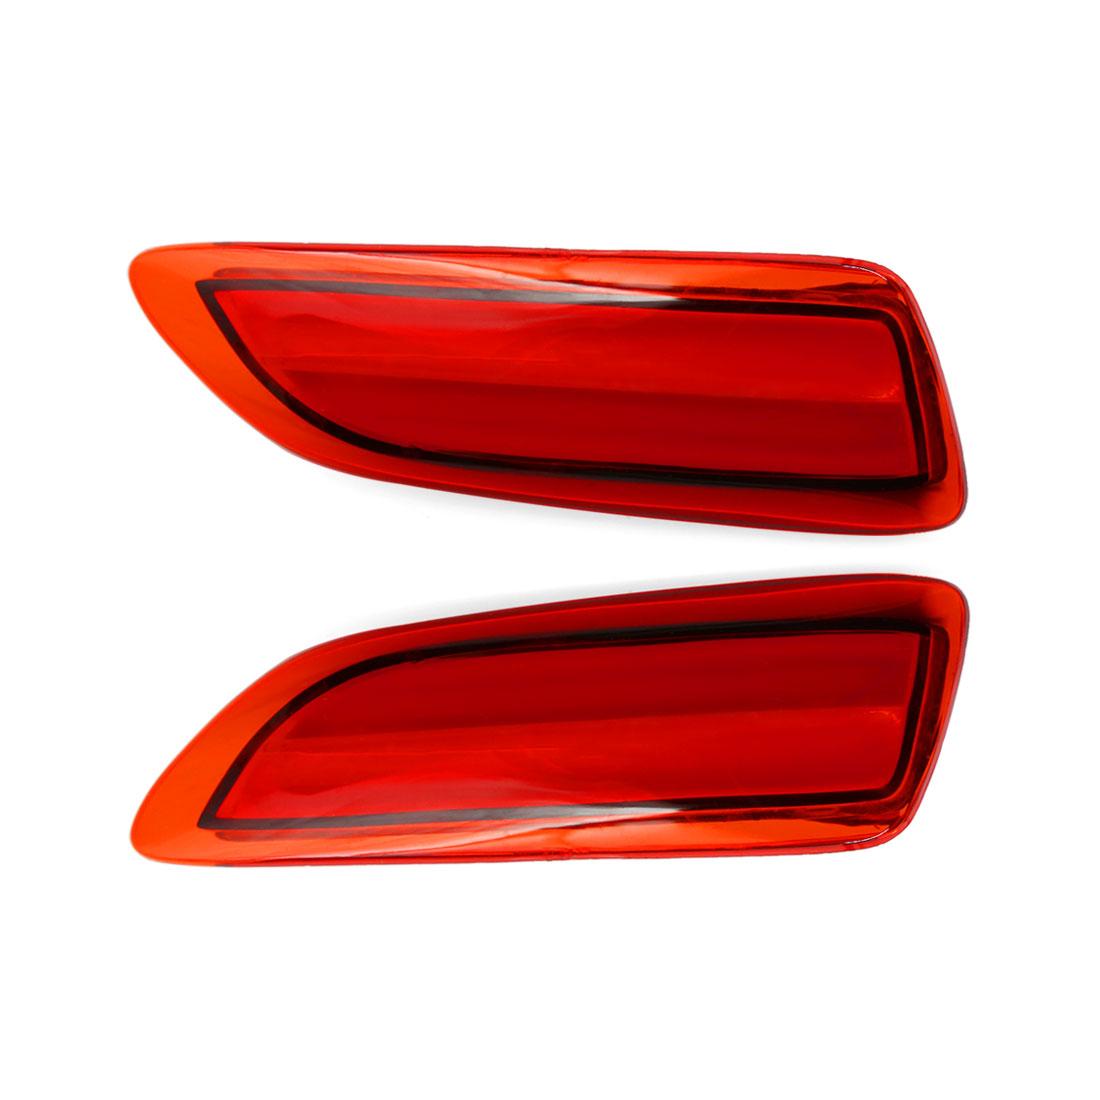 2 Pcs Red Lens Car Rear Bumper Reflector LED Backup Brake Light for Carora 2011